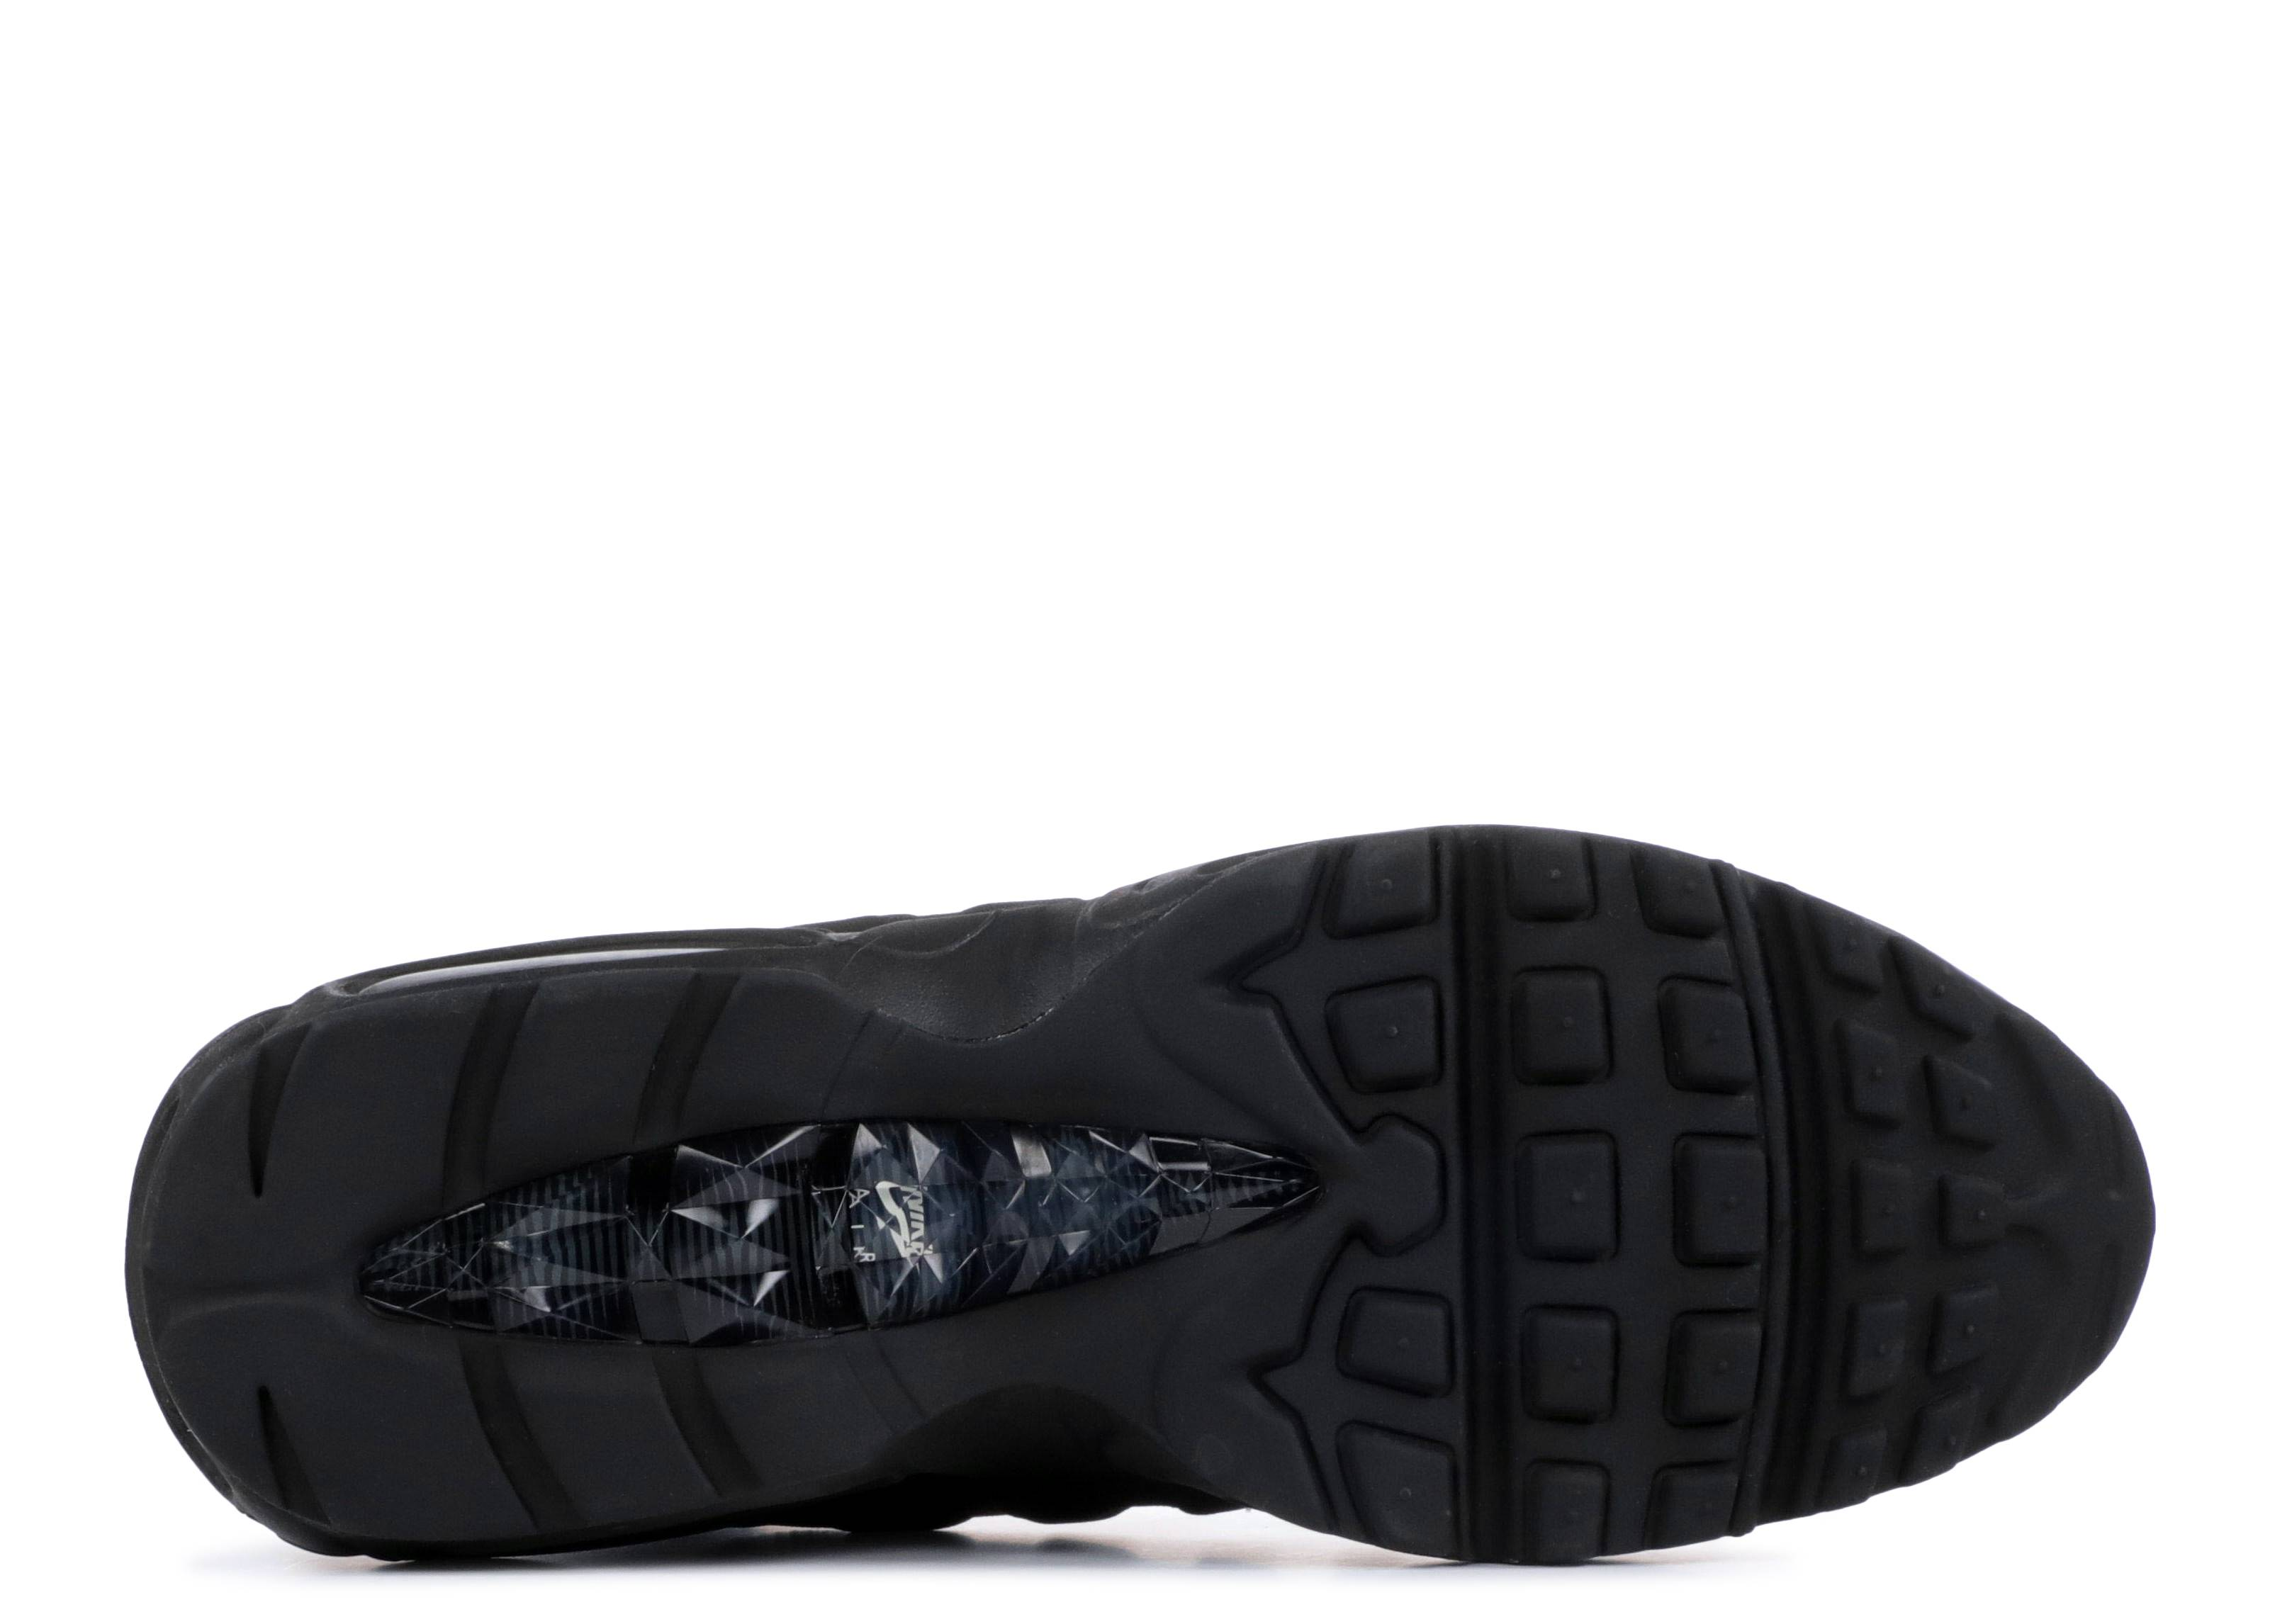 Zapatos NIKE Air Max 95 Sneakerboot 806809 001 BlackBlackAnthraciteWhite